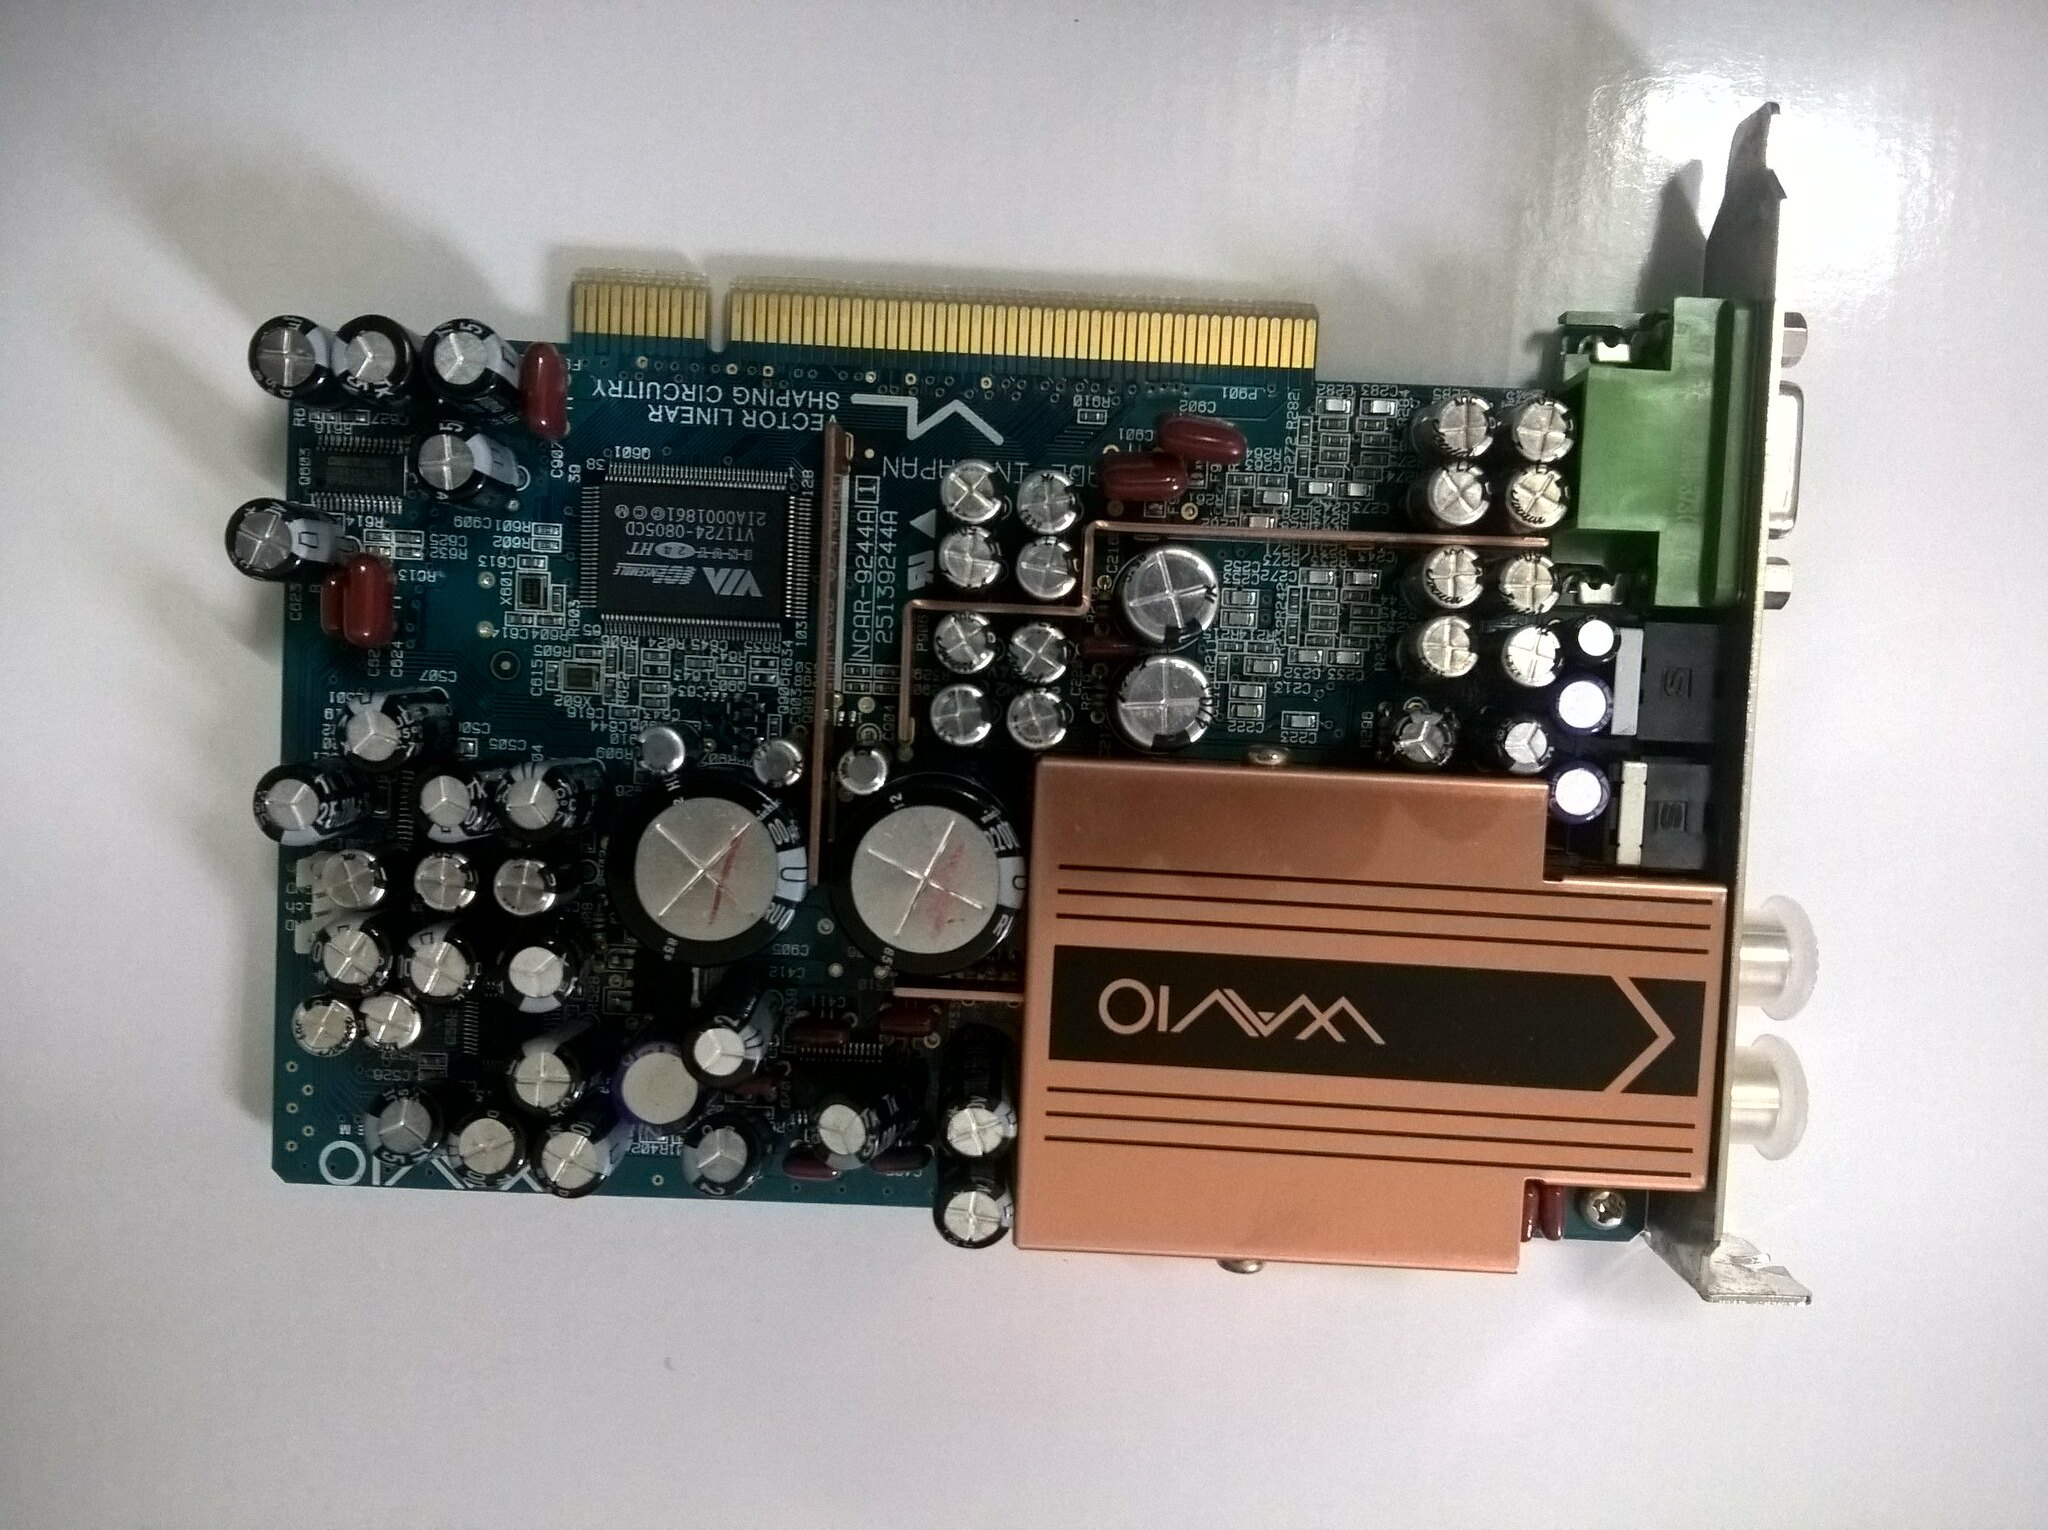 Onkyo từ Japan - U55SX, U55SX2, 200PCI LTD, 200PCI, 150PCI, 90PCI - 5